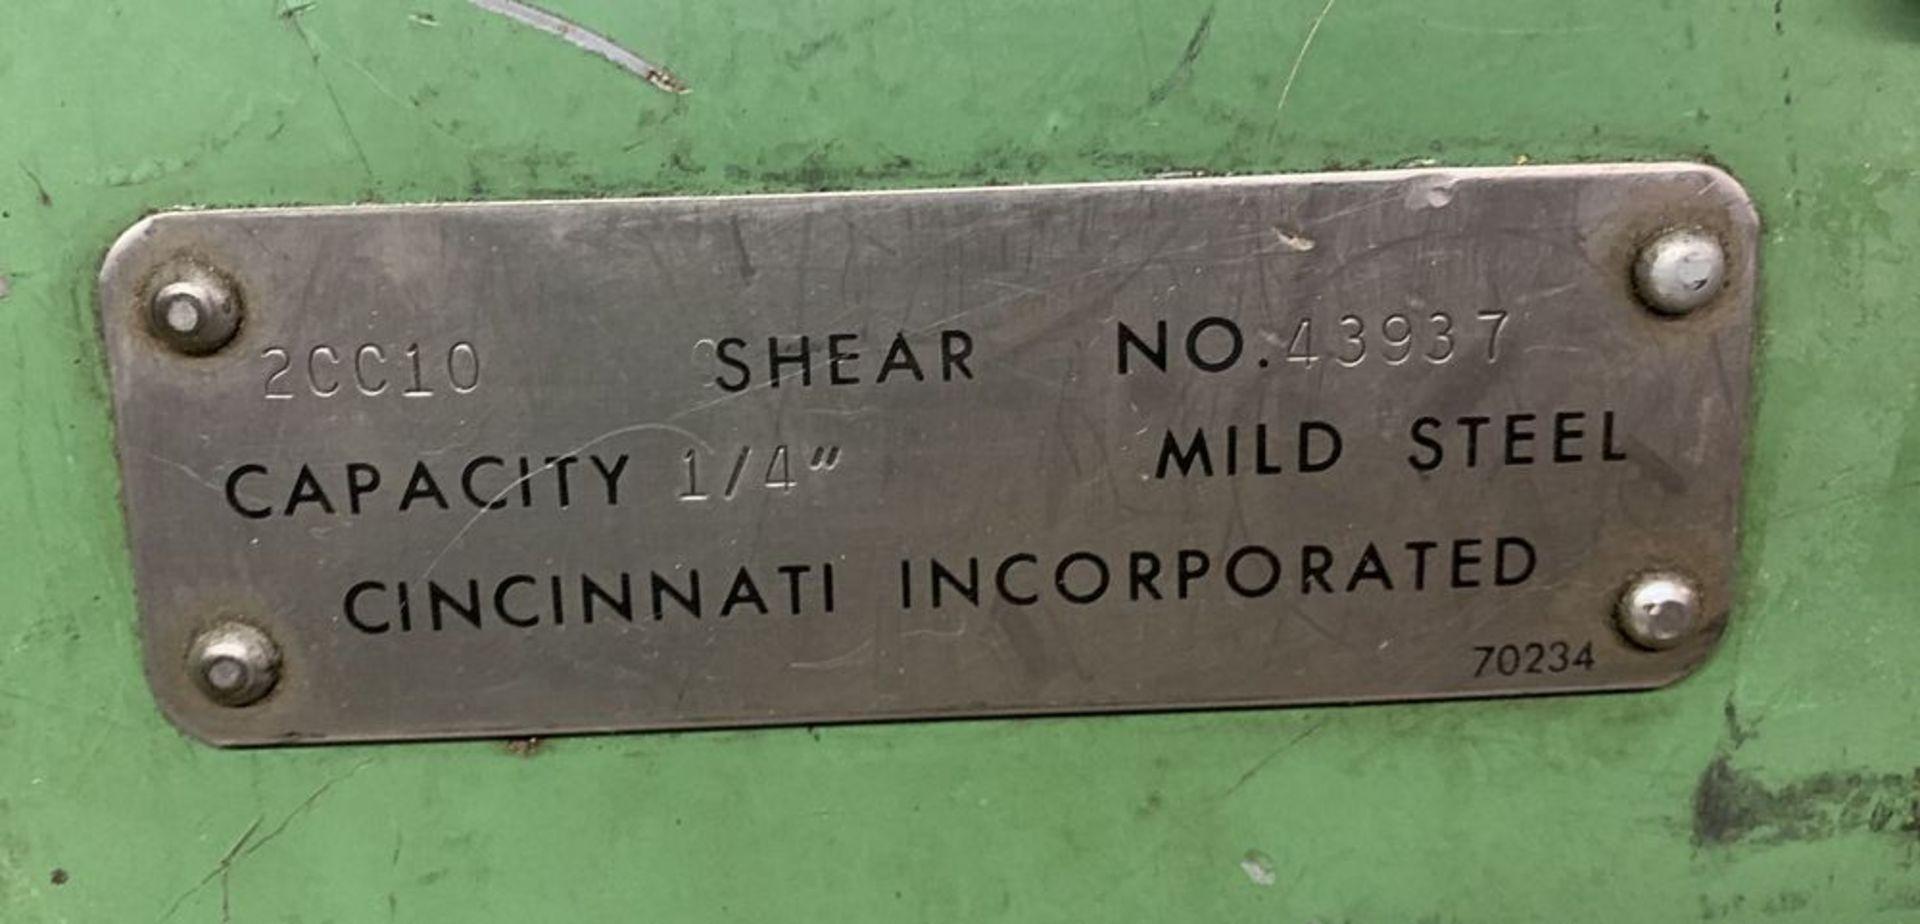 "Lot 30 - 10' x 1/4"" Cincinnati #2CC10 Shear, FOPBG, 10' sq. arm"